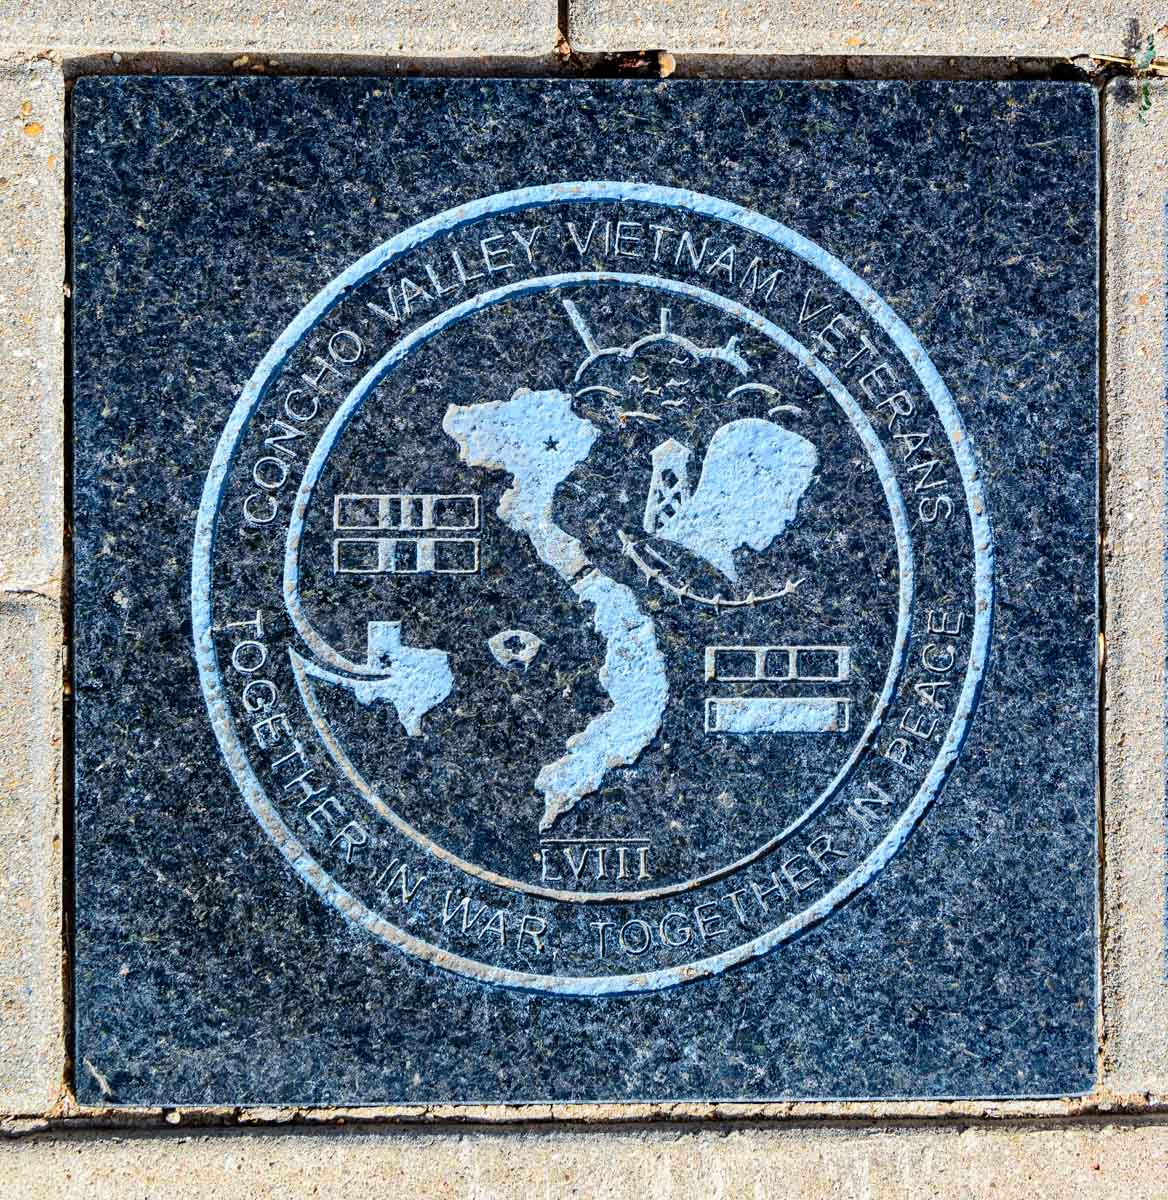 Concho Valley Vietnam Veterans Memorial